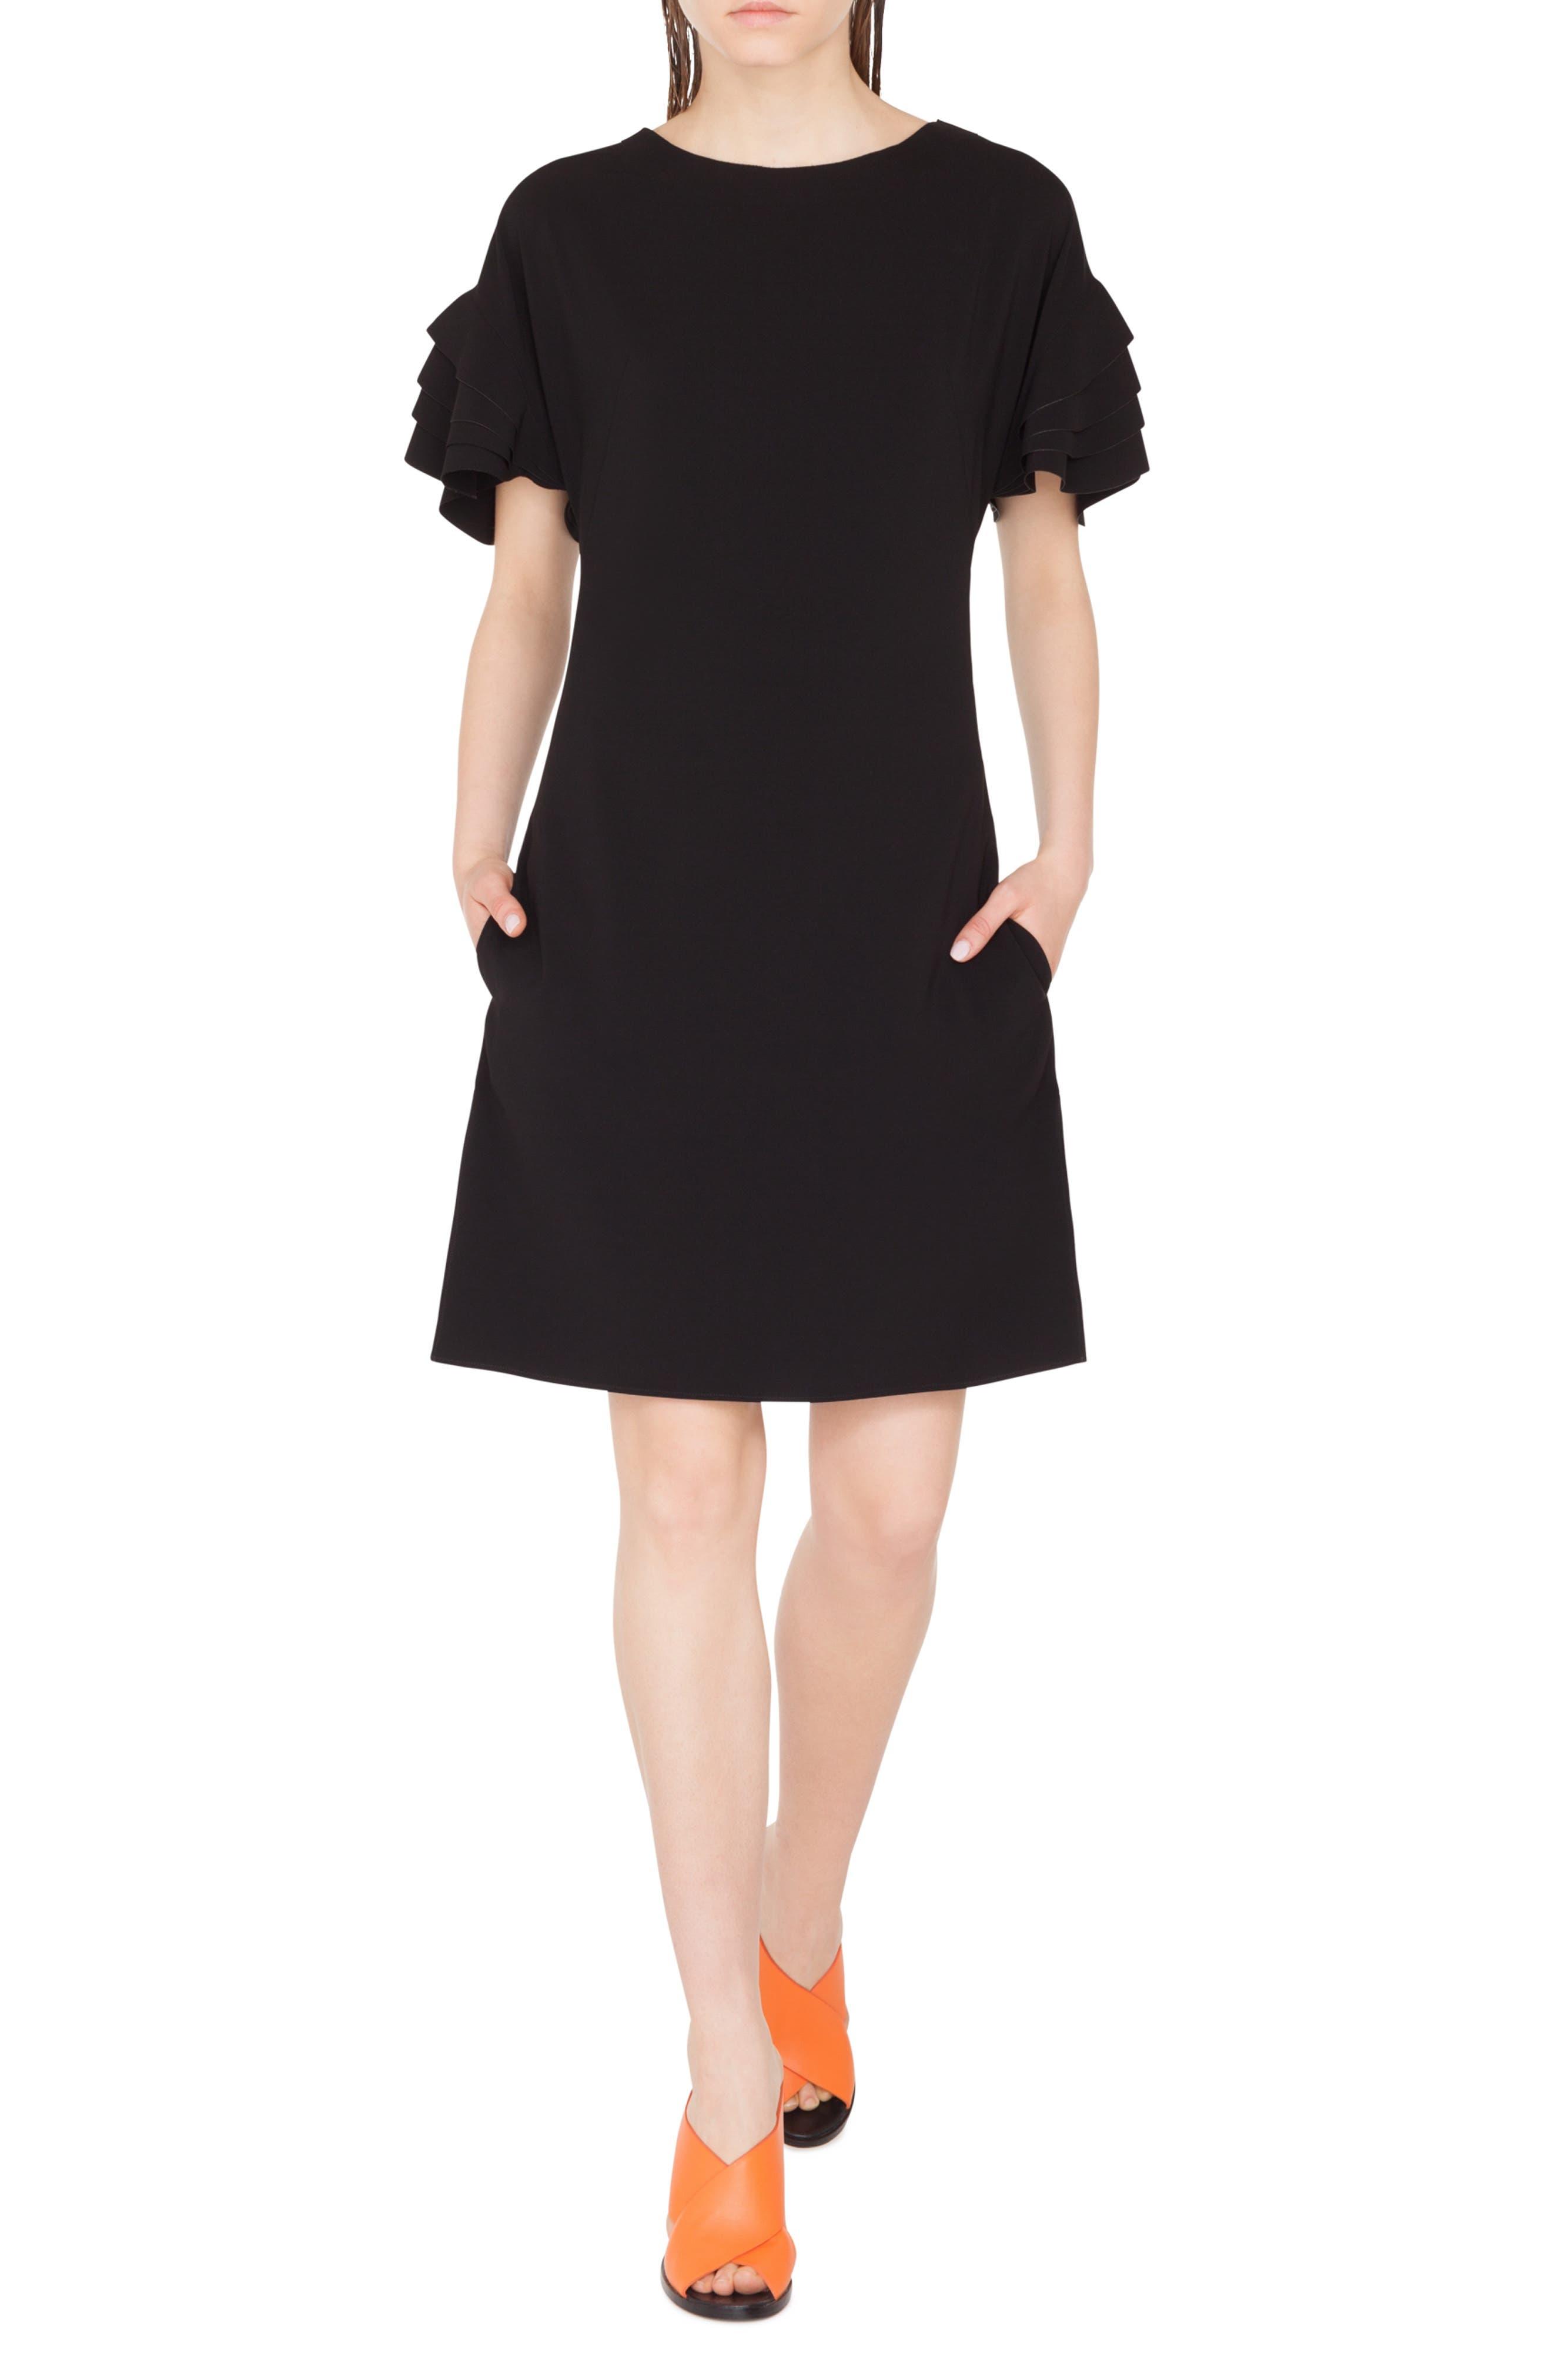 AKRIS PUNTO Layered Sleeve Dress, Main, color, NERO